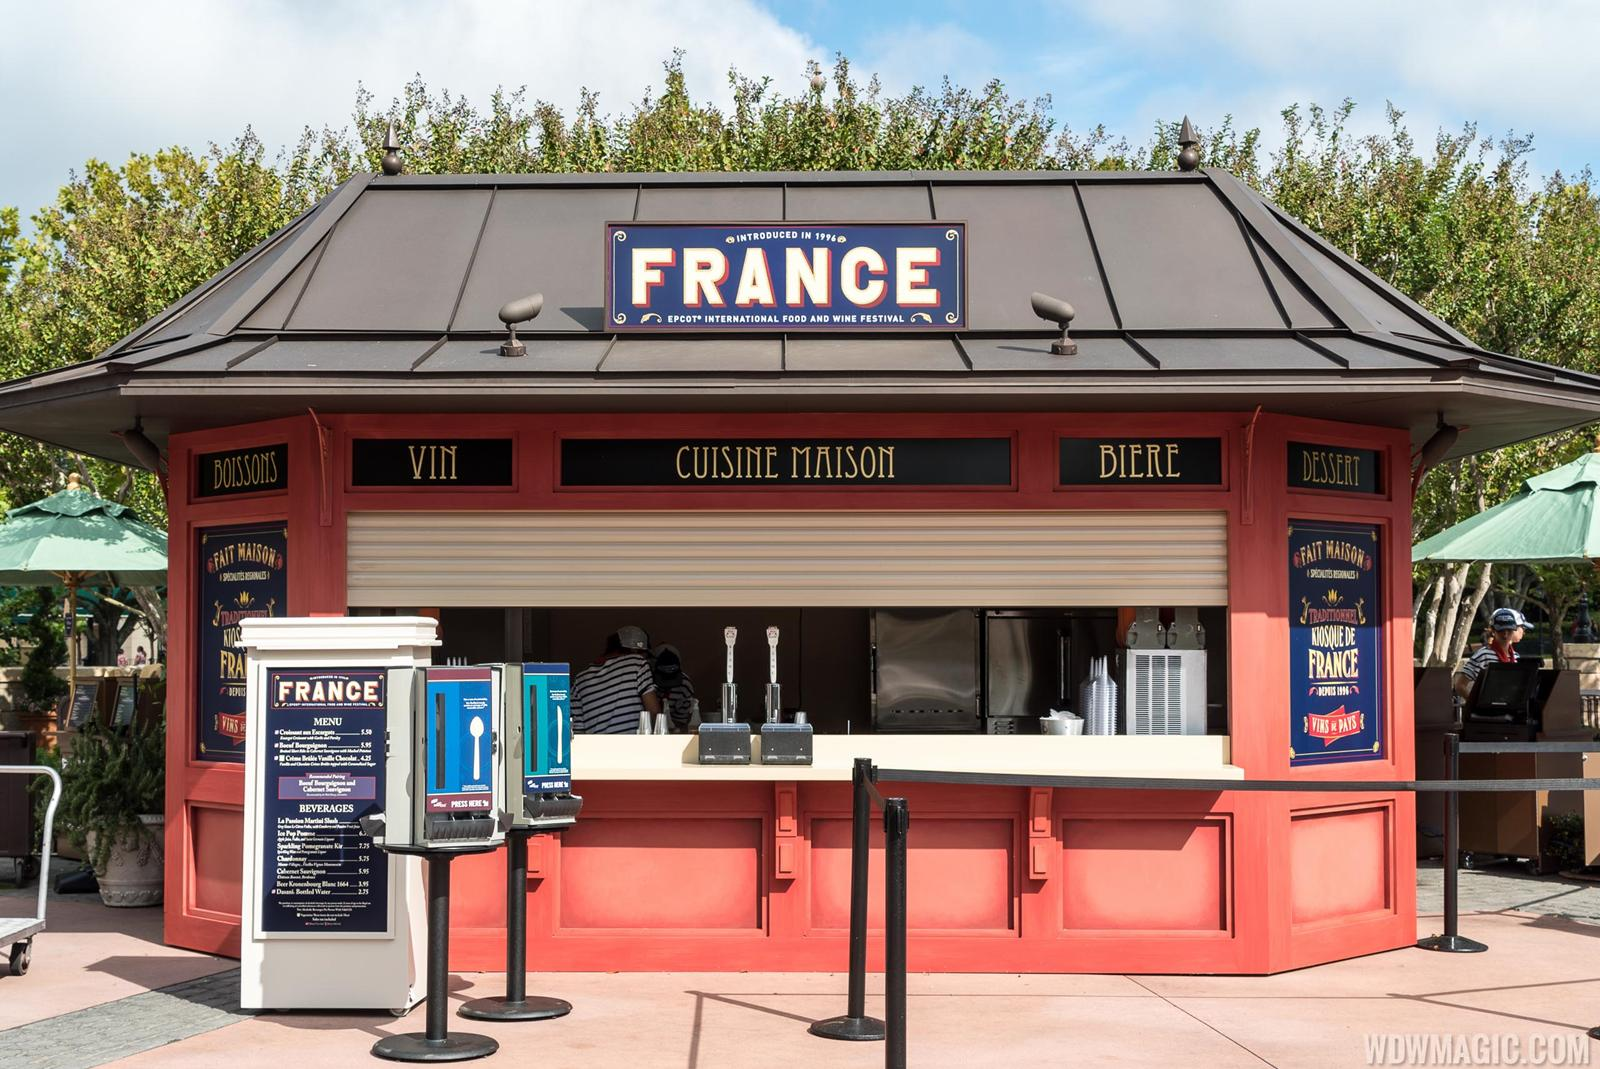 France Food and Wine Festival kiosk 2015